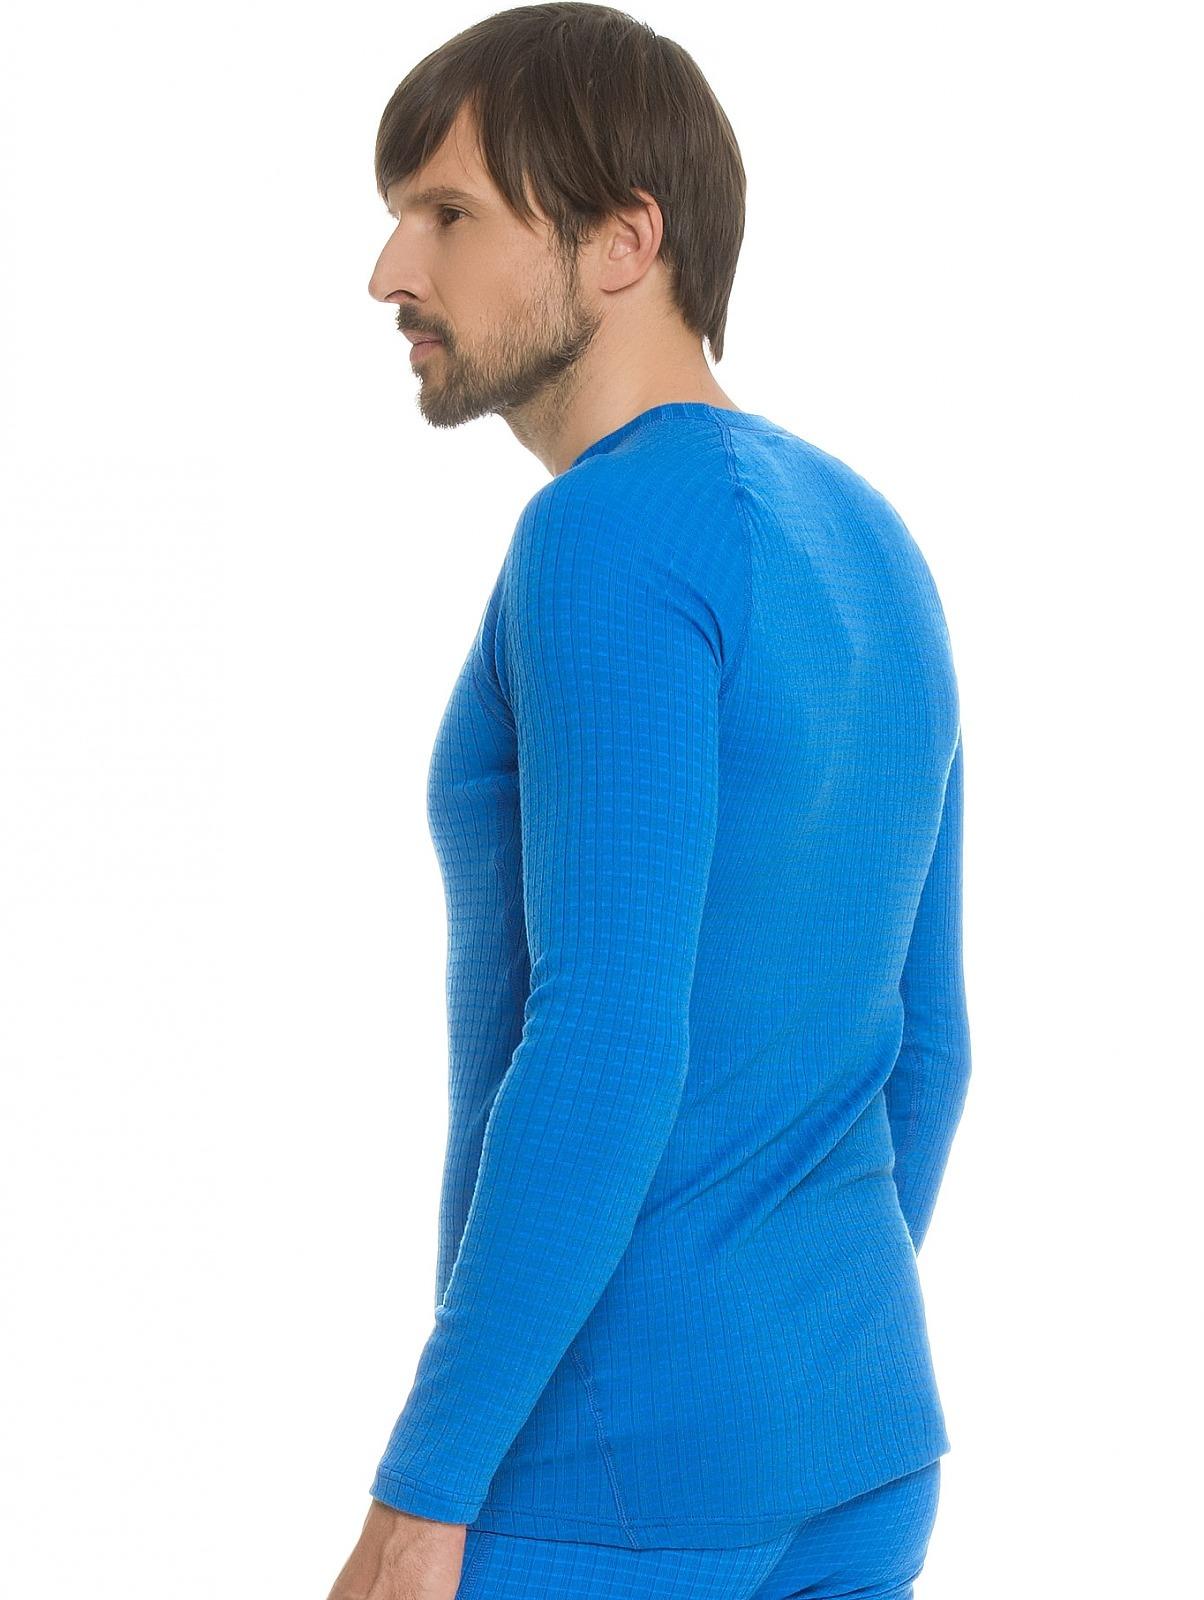 Мужская терморубашка крафт Warm Wool Black blue (1903726-1336) фото